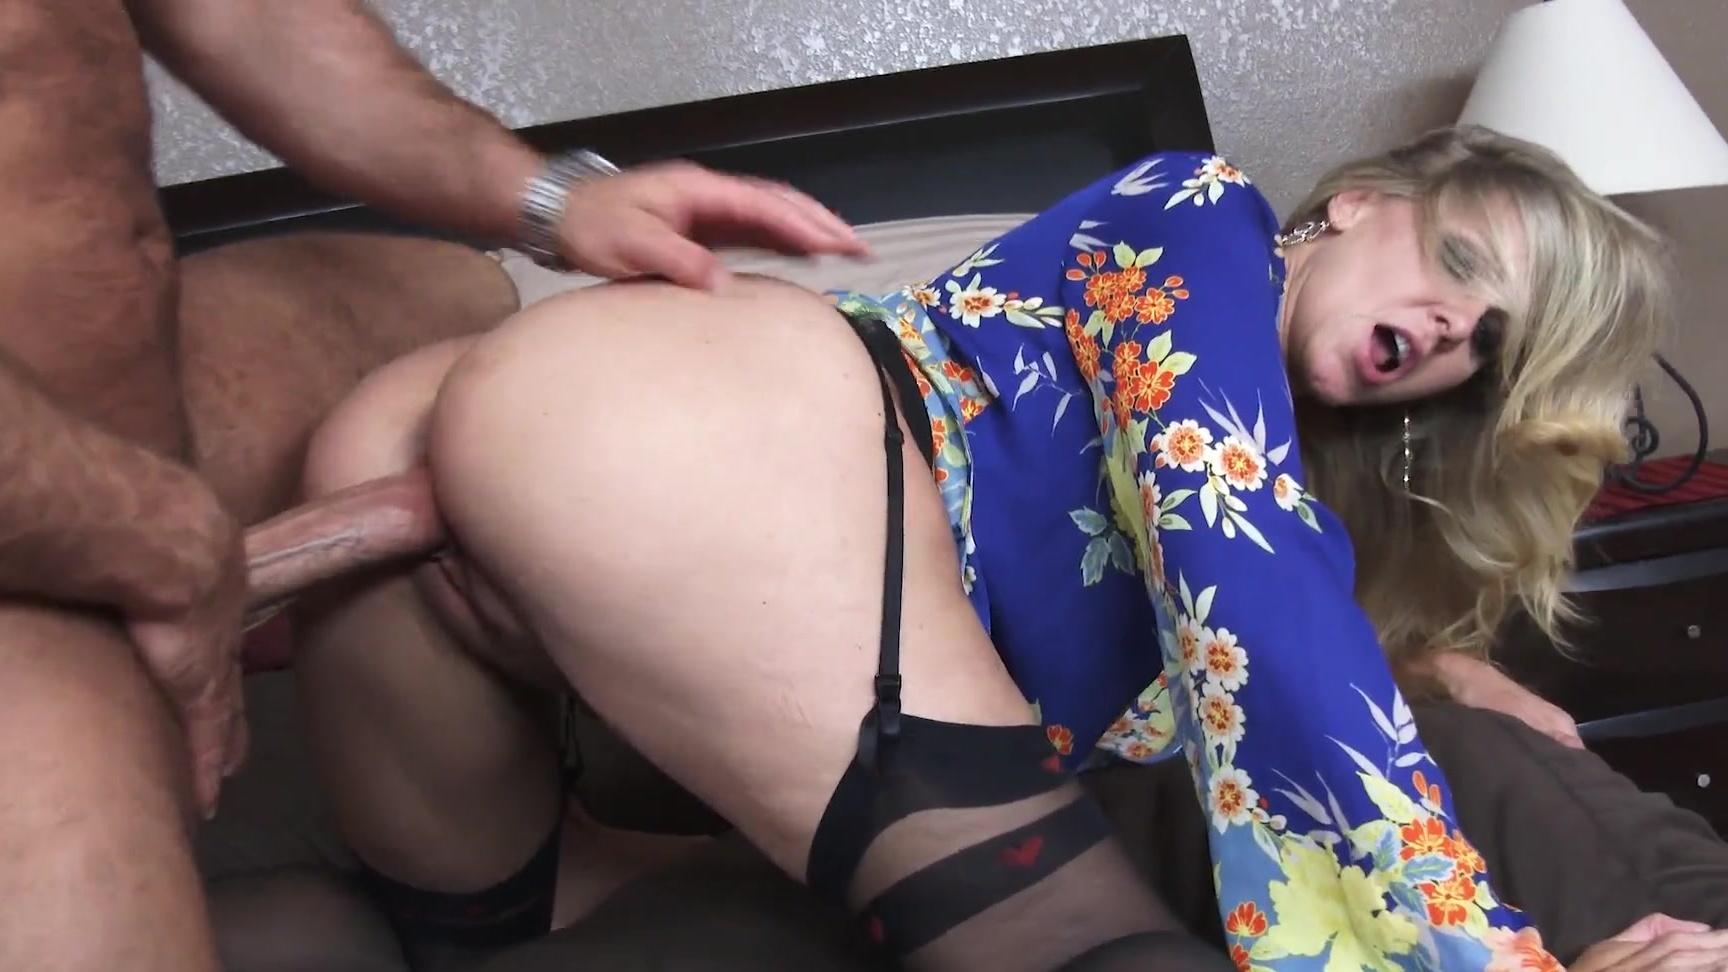 Redhead stockings porn gif